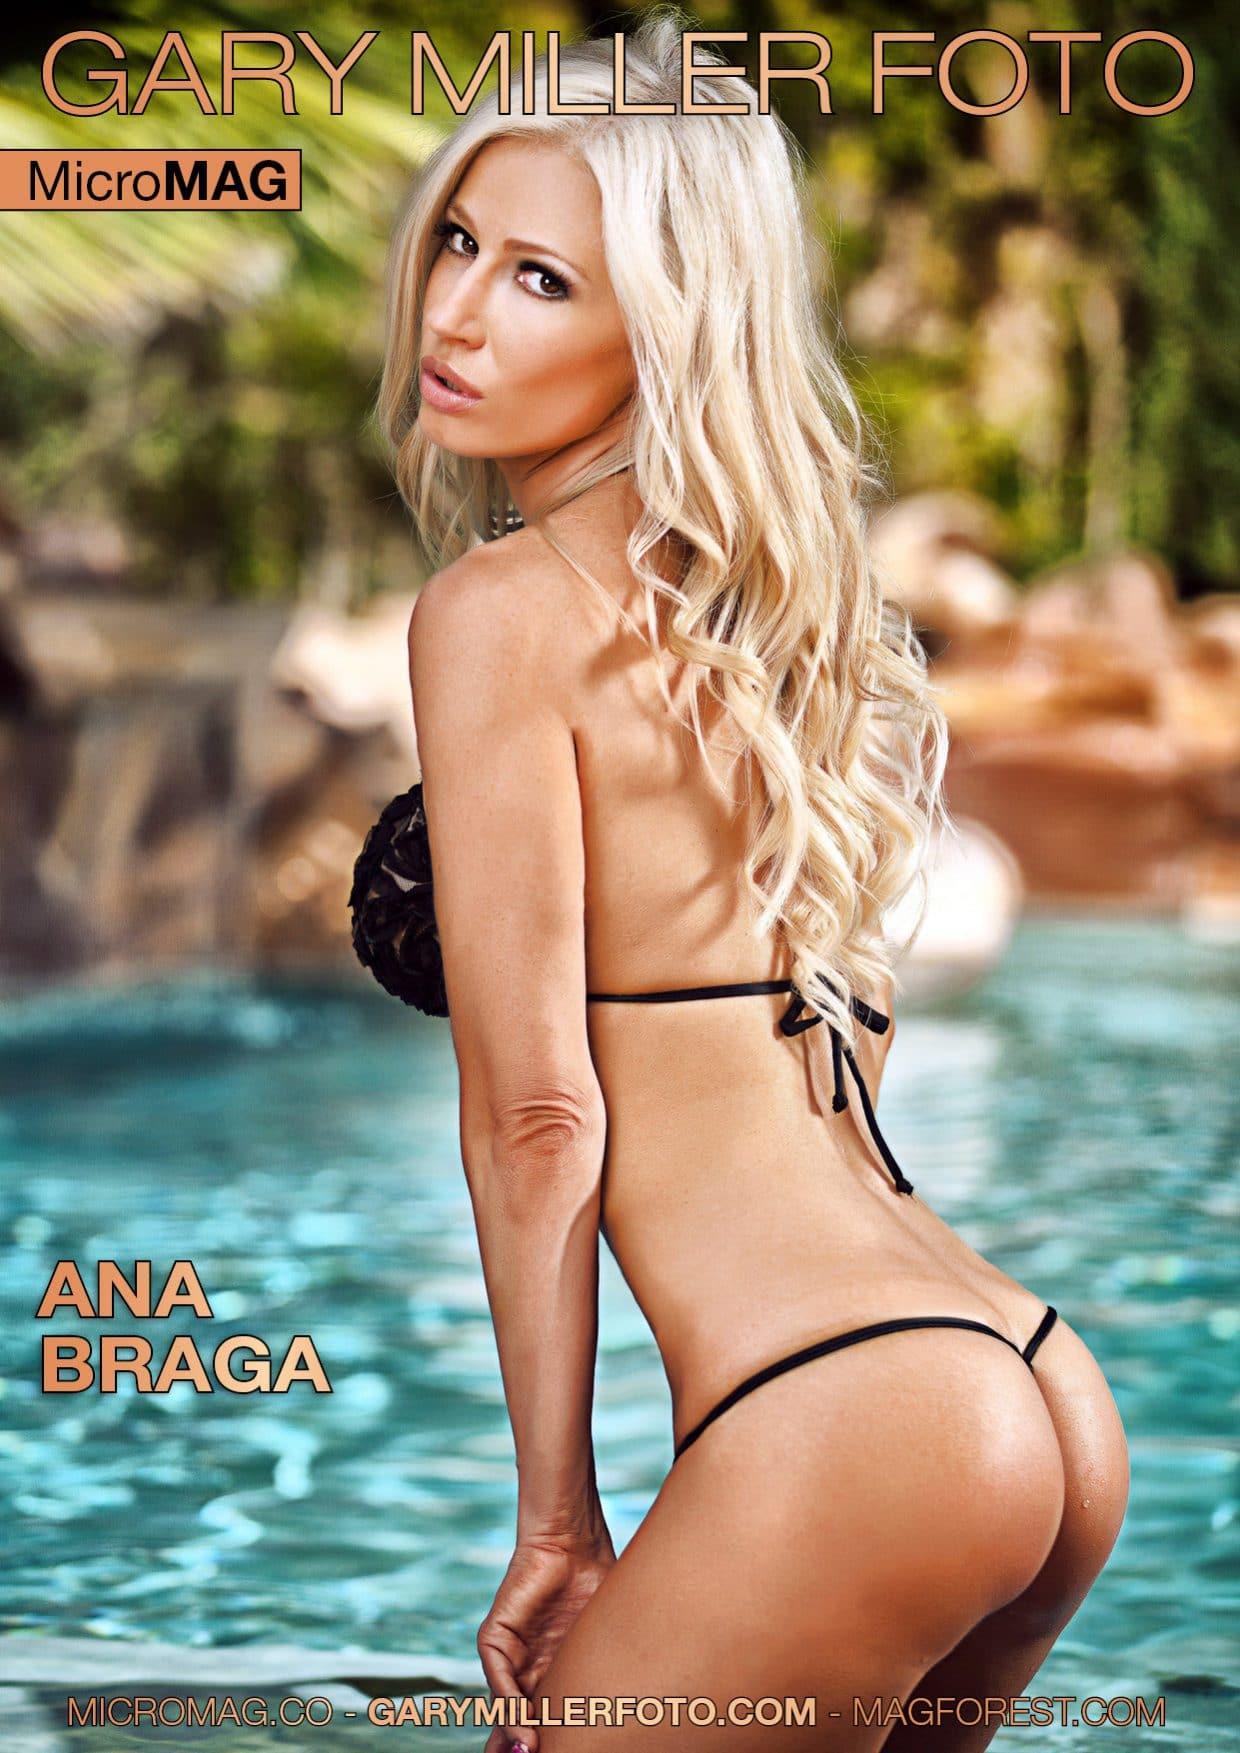 Gary Miller Foto Micromag – Ana Braga – Issue 4